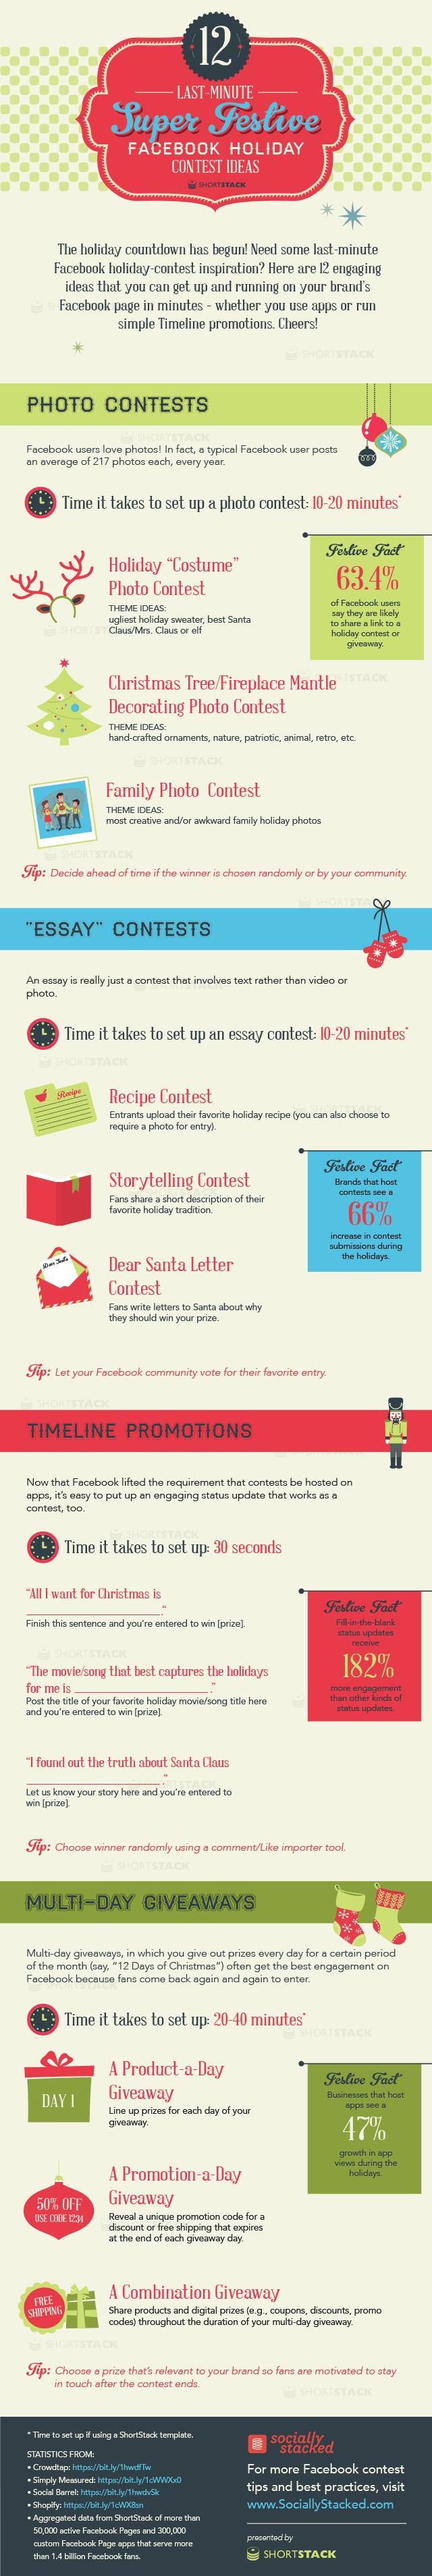 holiday Facebook contest ideas